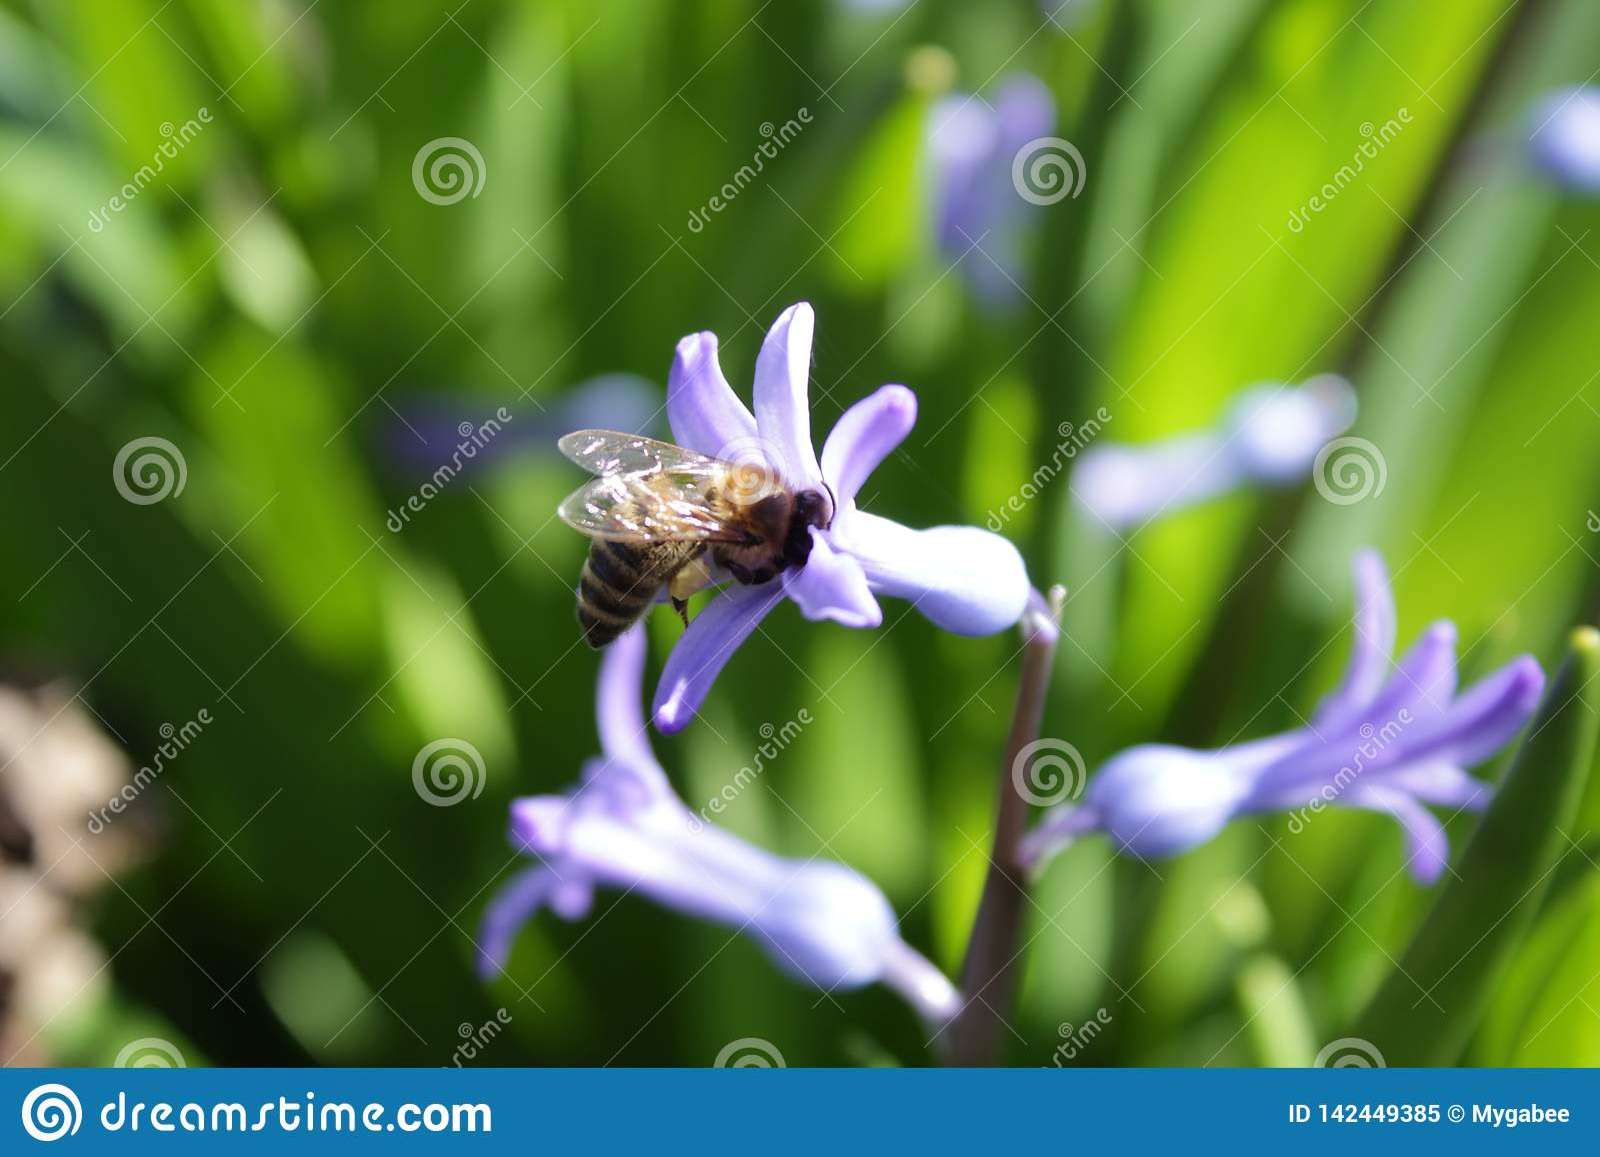 El jacinto visitó por una abeja